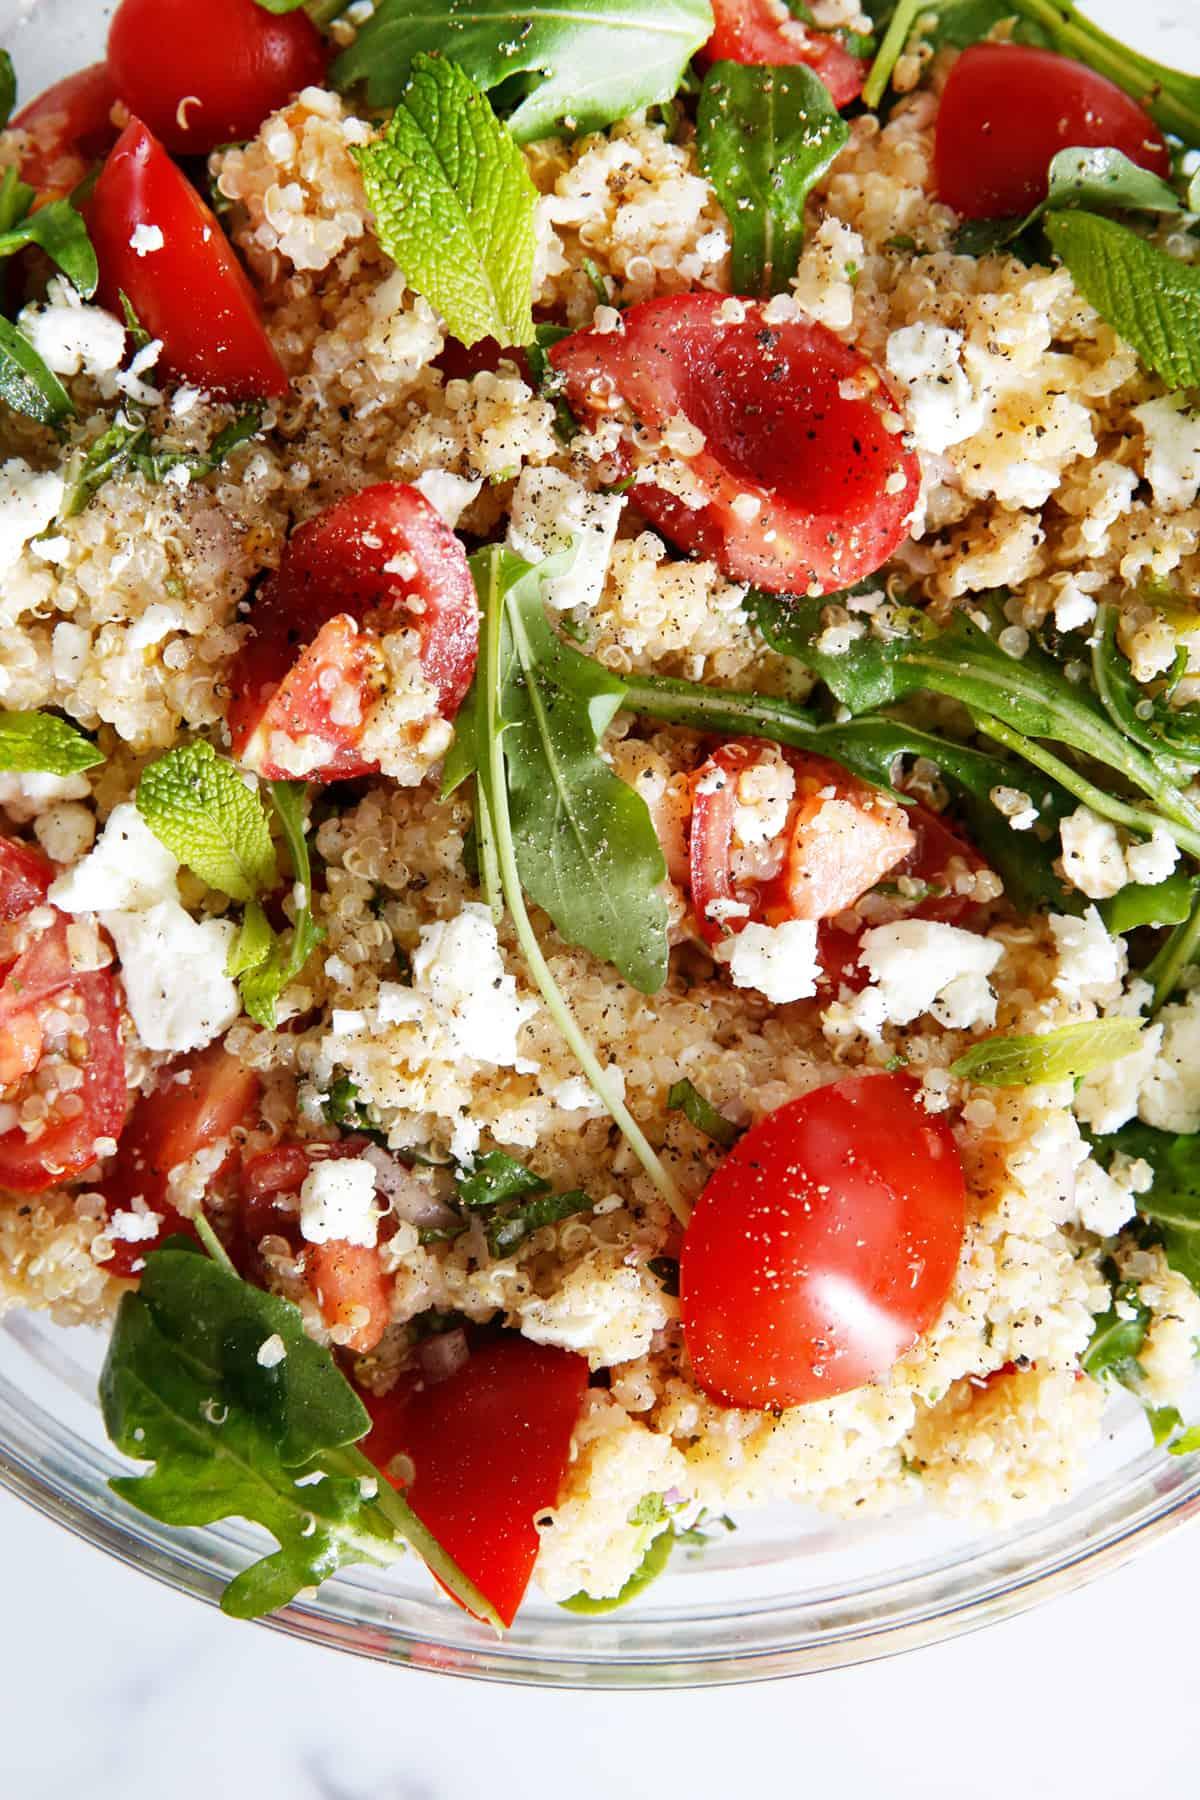 Mediterranean Quinoa Salad recipe in a bowl